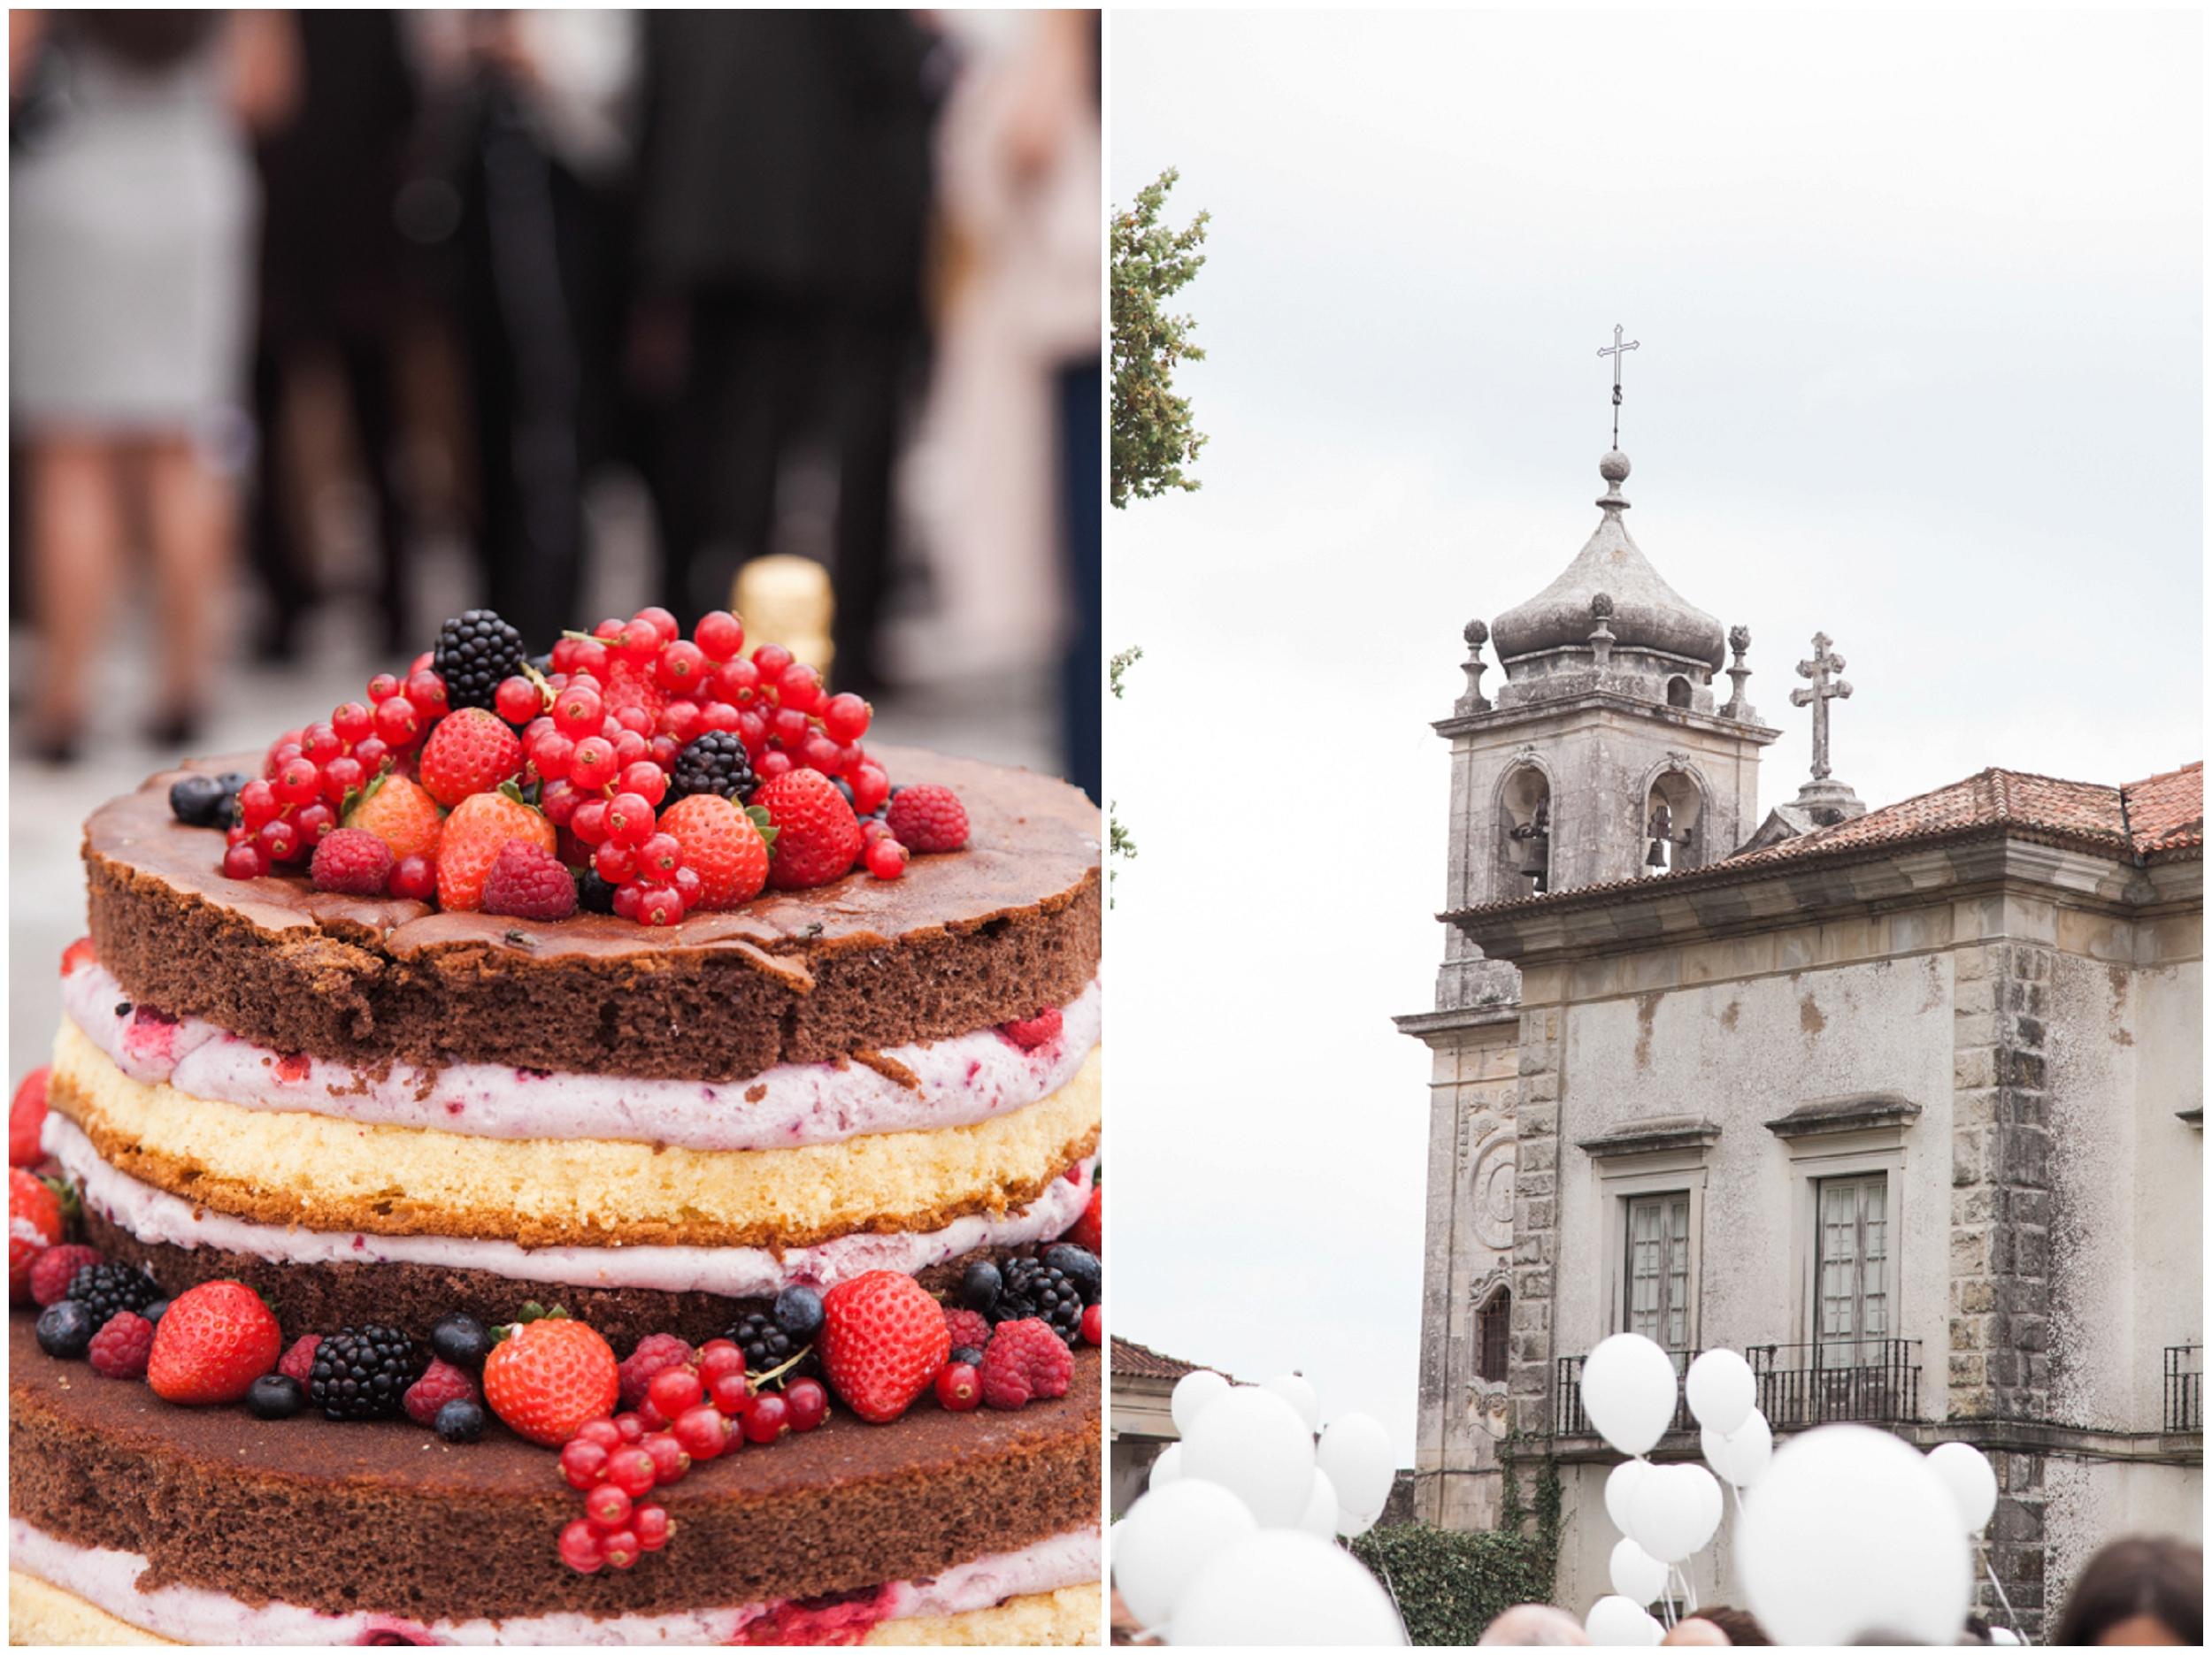 maria+rao+wedding+photographer+portugal_0216.jpg